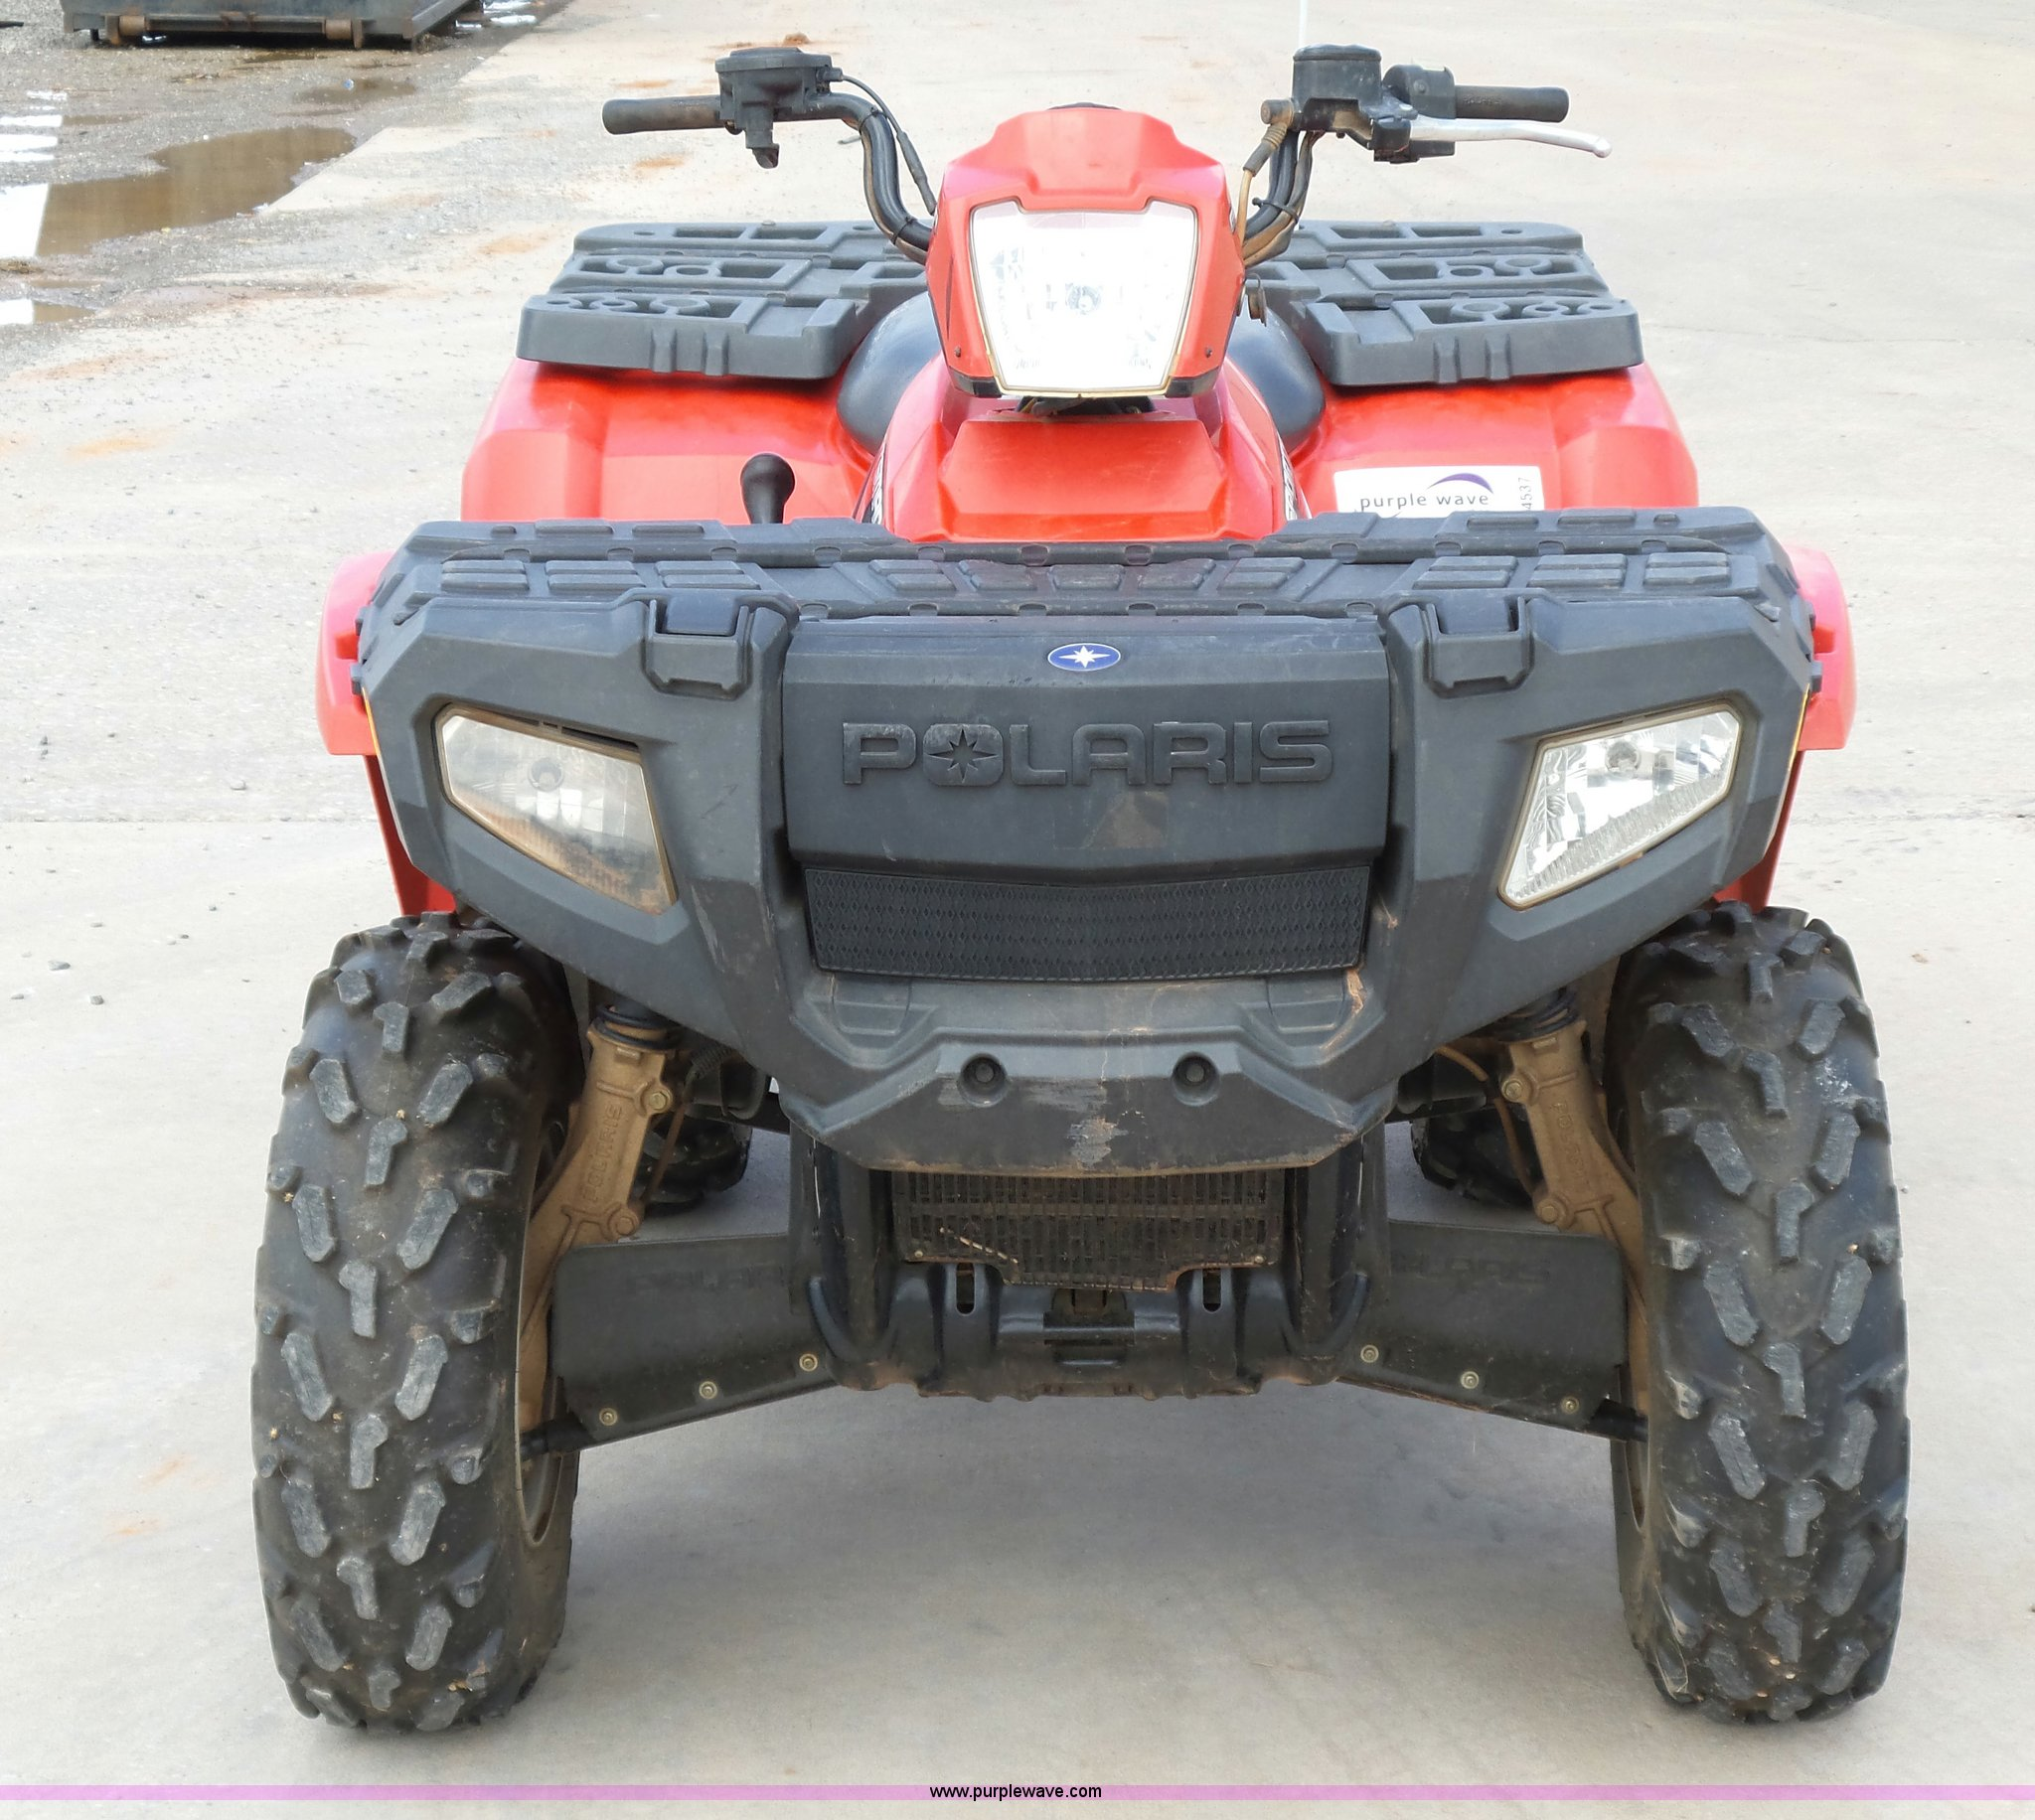 ... 2008 Polaris Sportsman 500 ATV Full size in new window ...